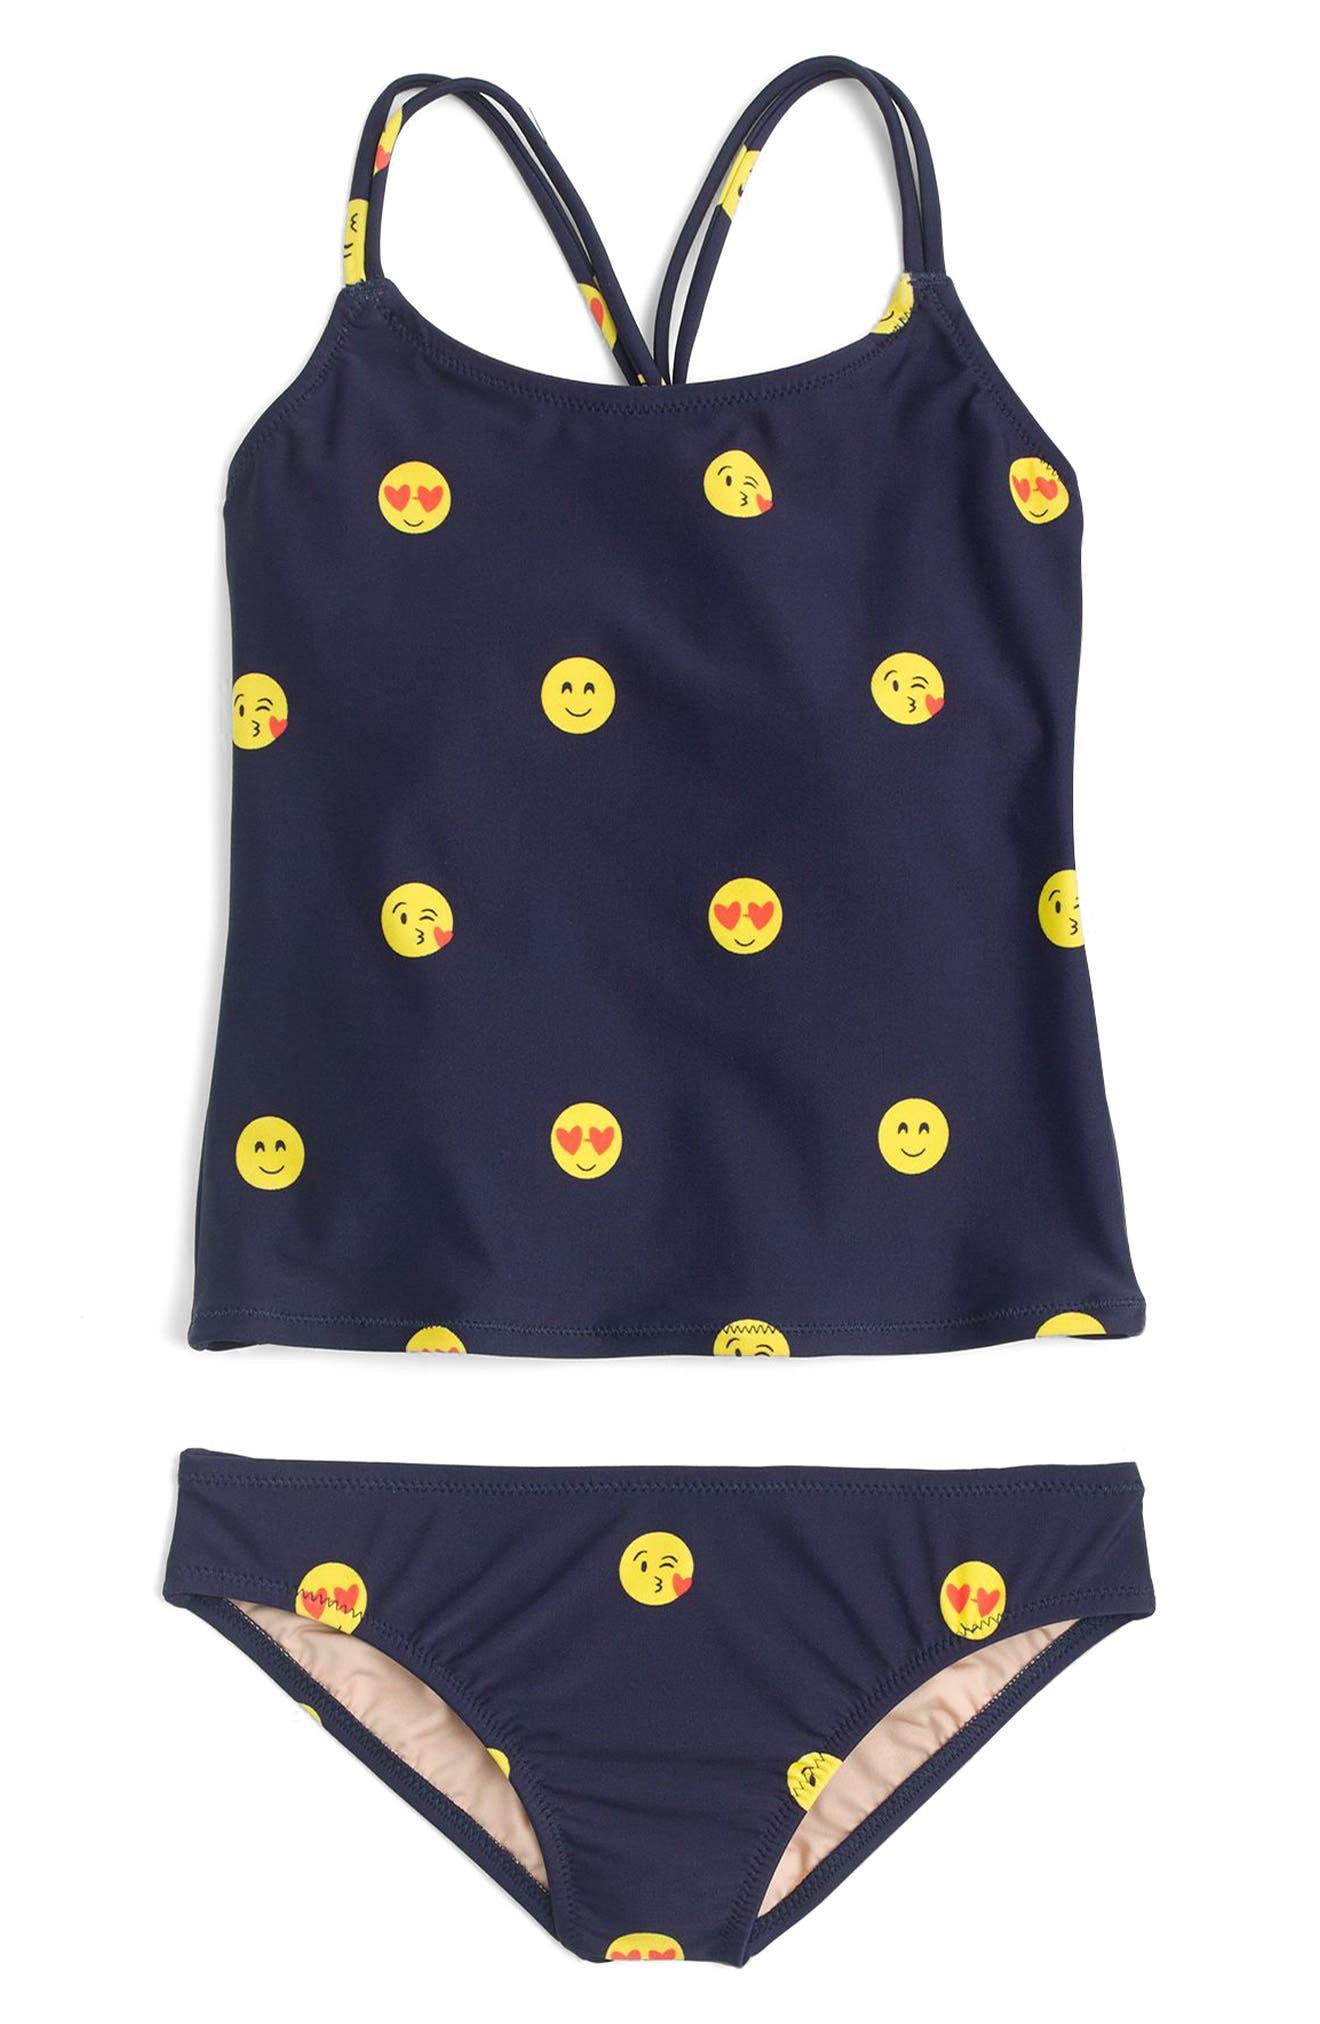 Emoji Two-Piece Swimsuit,                             Main thumbnail 1, color,                             Navy/ Lemon